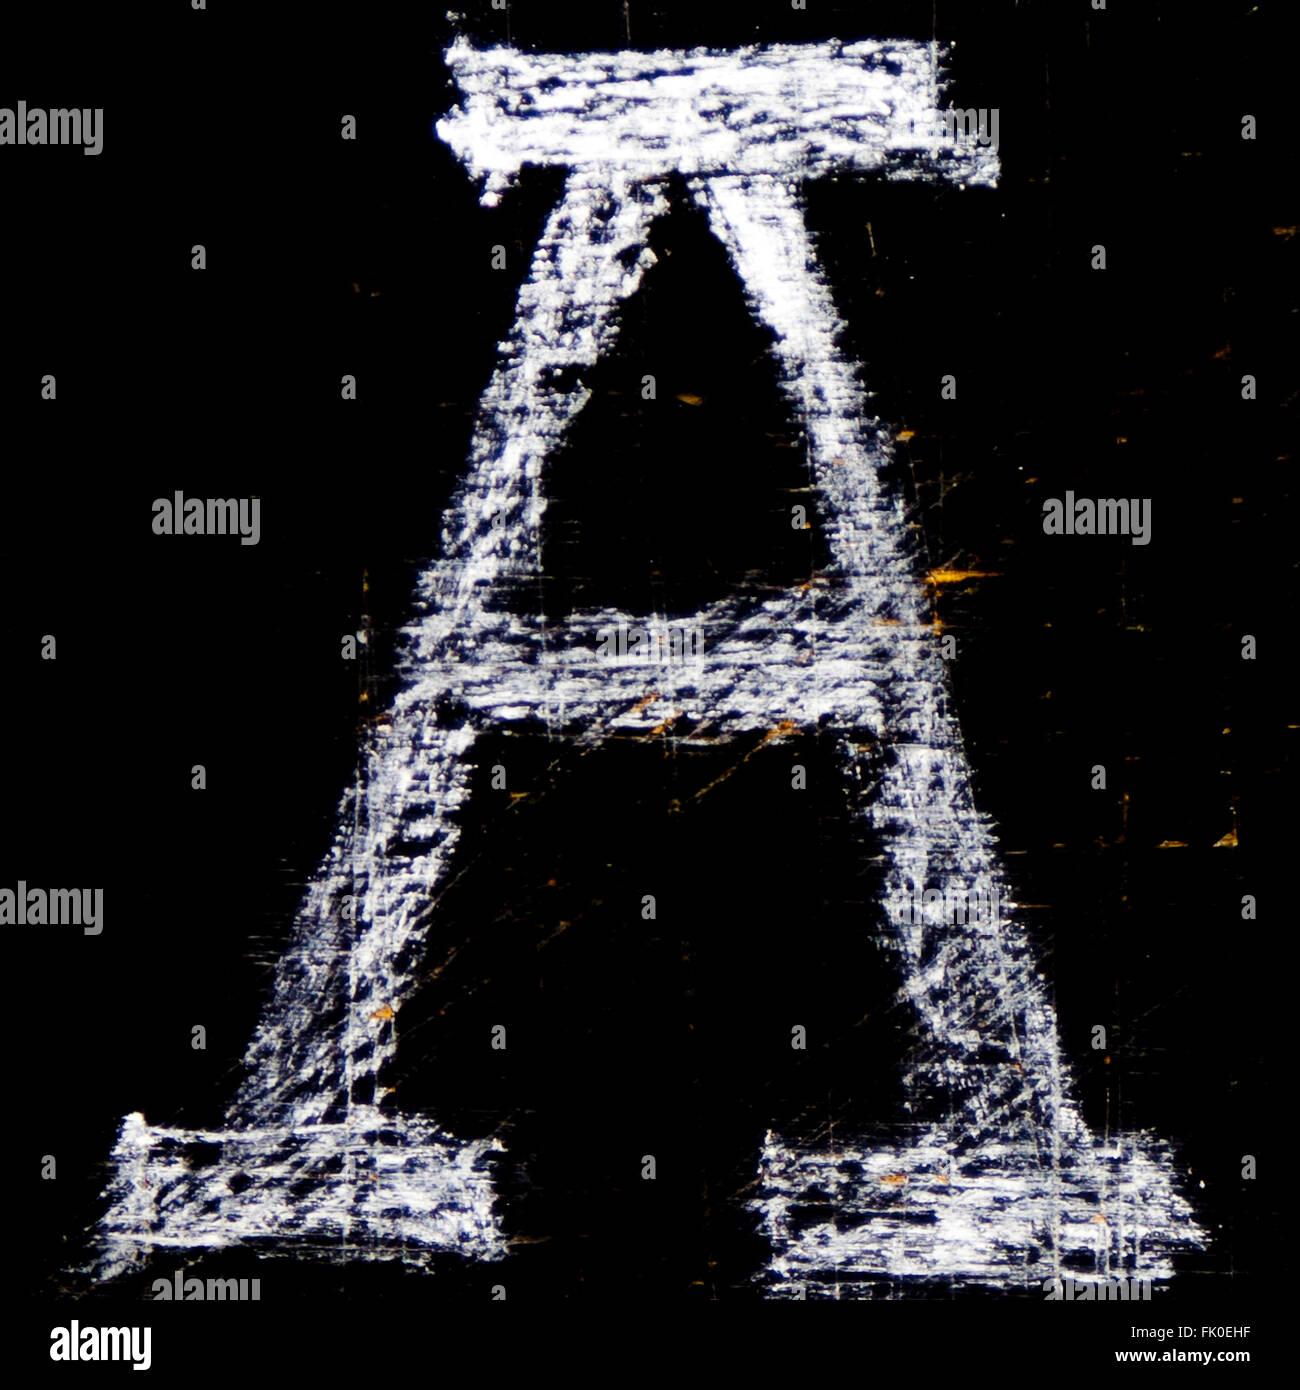 Chalkboard letter A - Stock Image